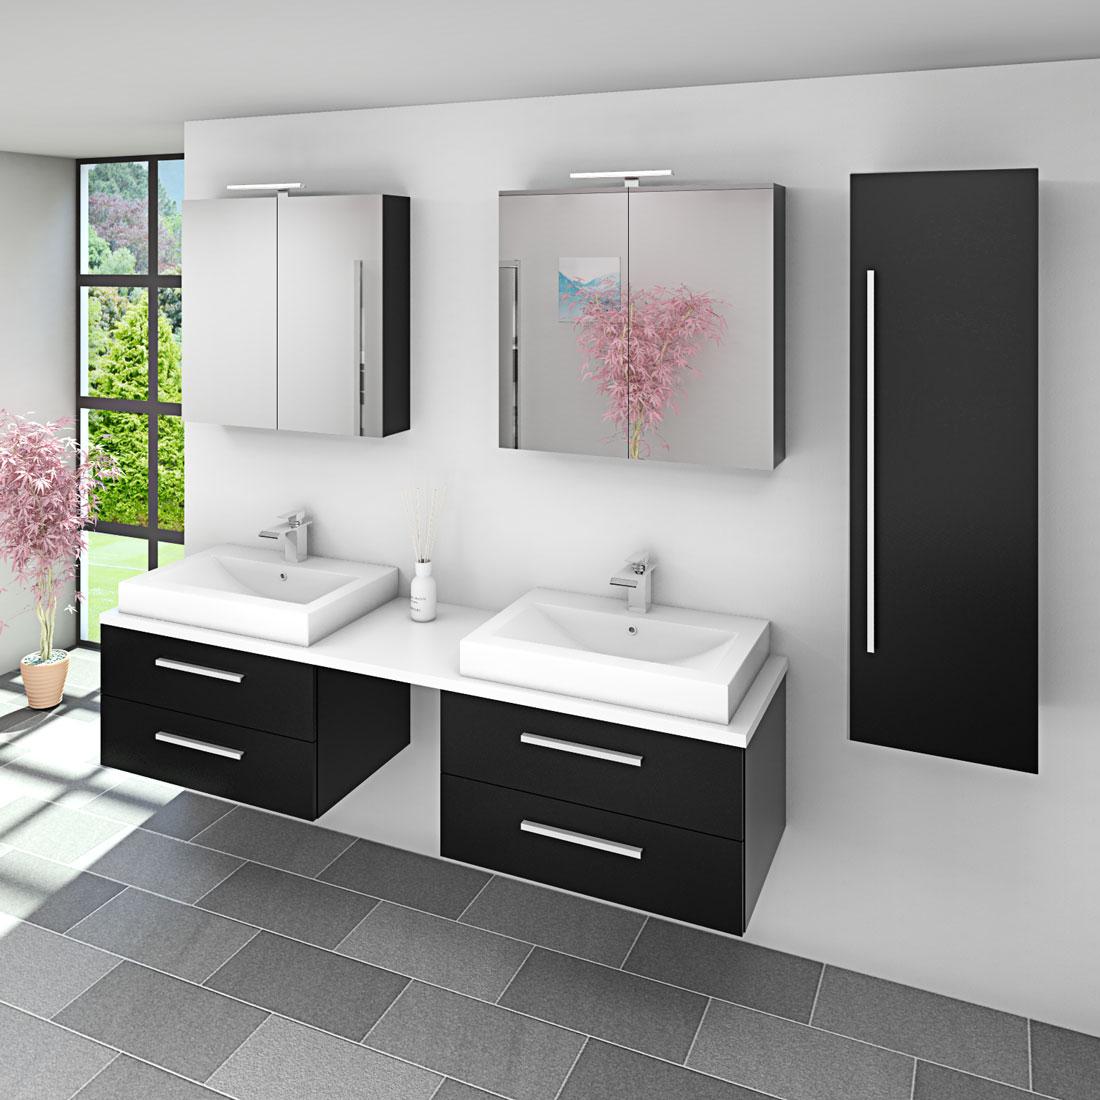 badm bel set city 207 v3 esche schwarz badezimmerm bel waschtisch 200cm. Black Bedroom Furniture Sets. Home Design Ideas